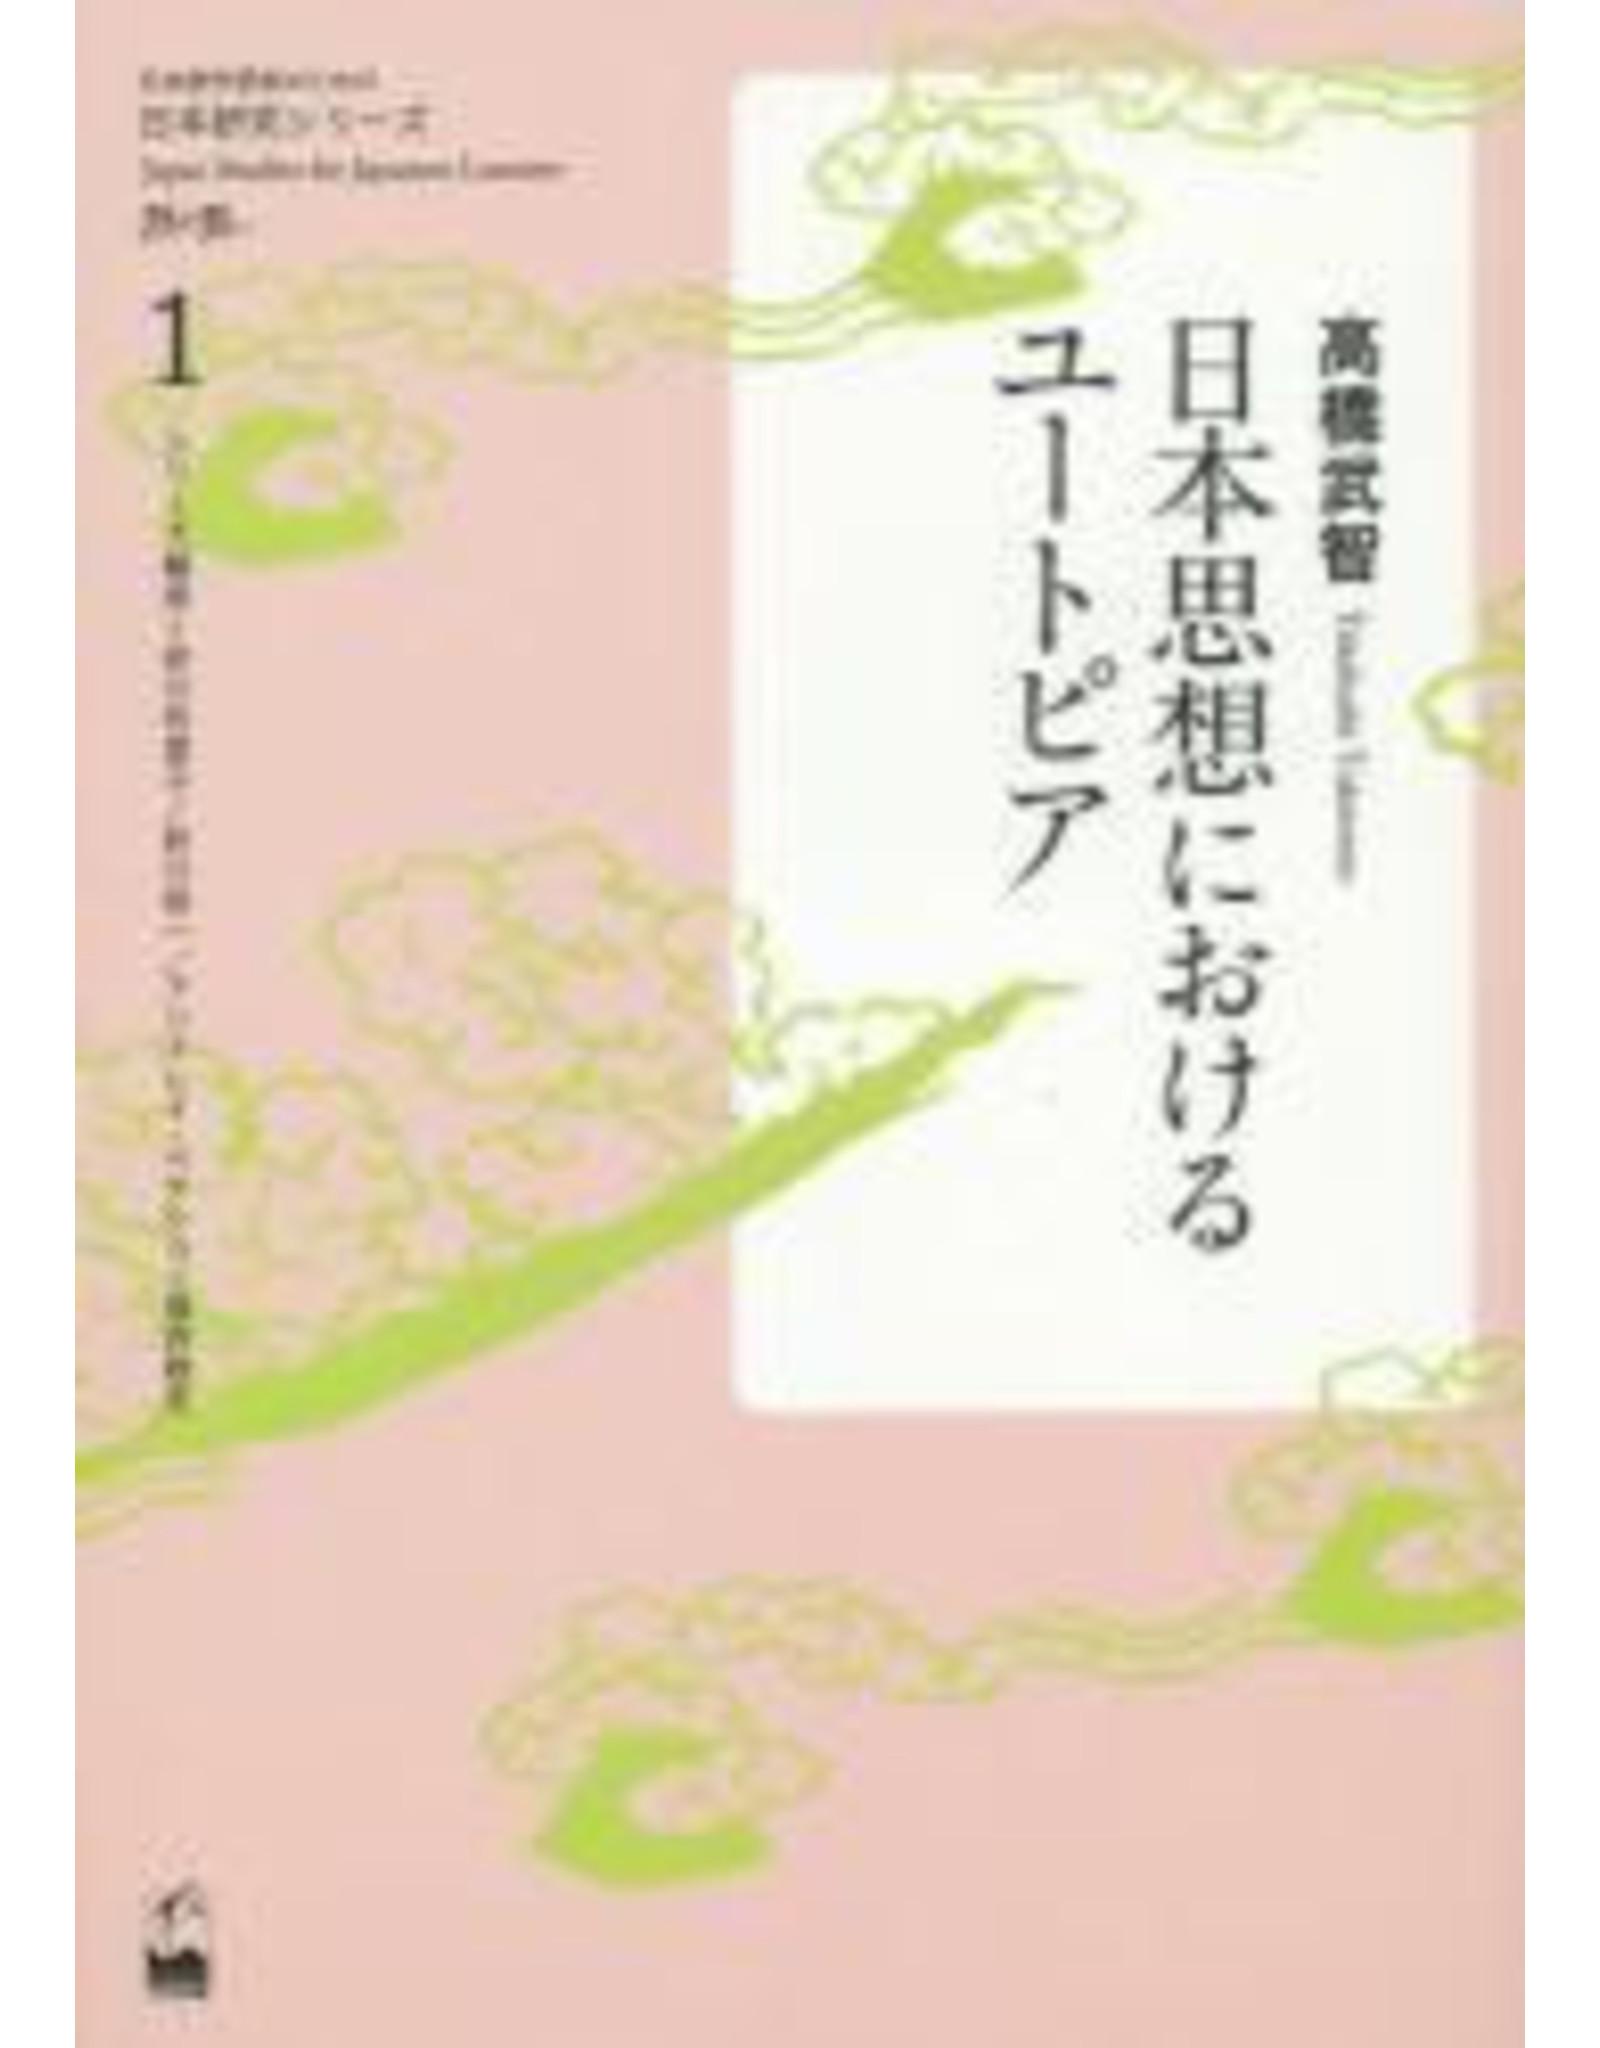 KUROSHIO JAPAN STUDIES FOR JAPANESE LEARNERS - NIHON SHISOU NI OKERU UTOPIA